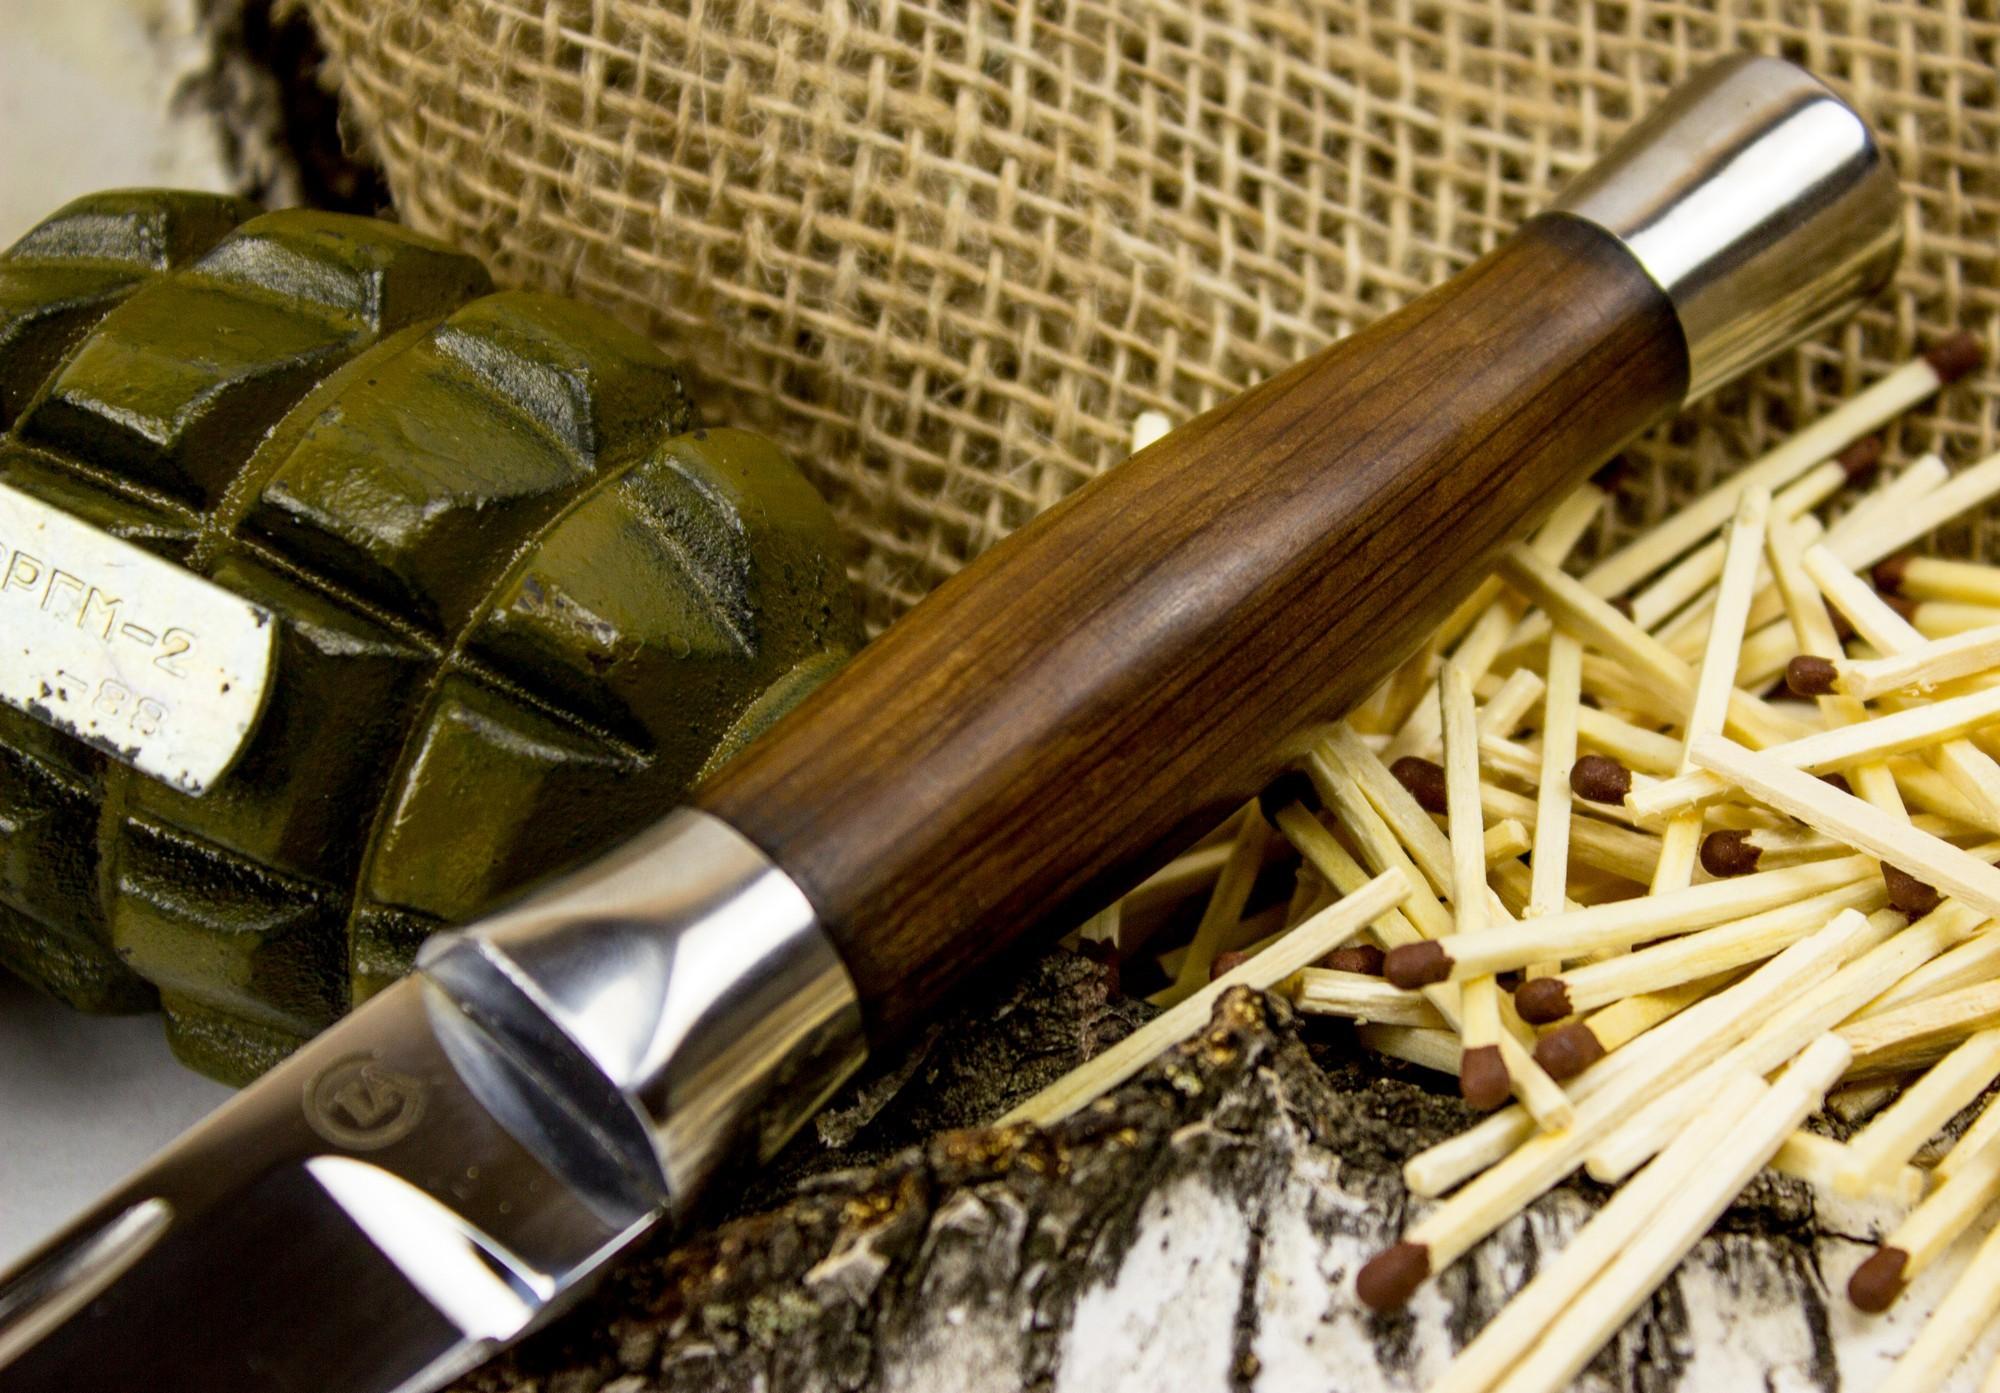 Фото 4 - Нож Горец-3М, сталь 95х18 от Титов и Солдатова